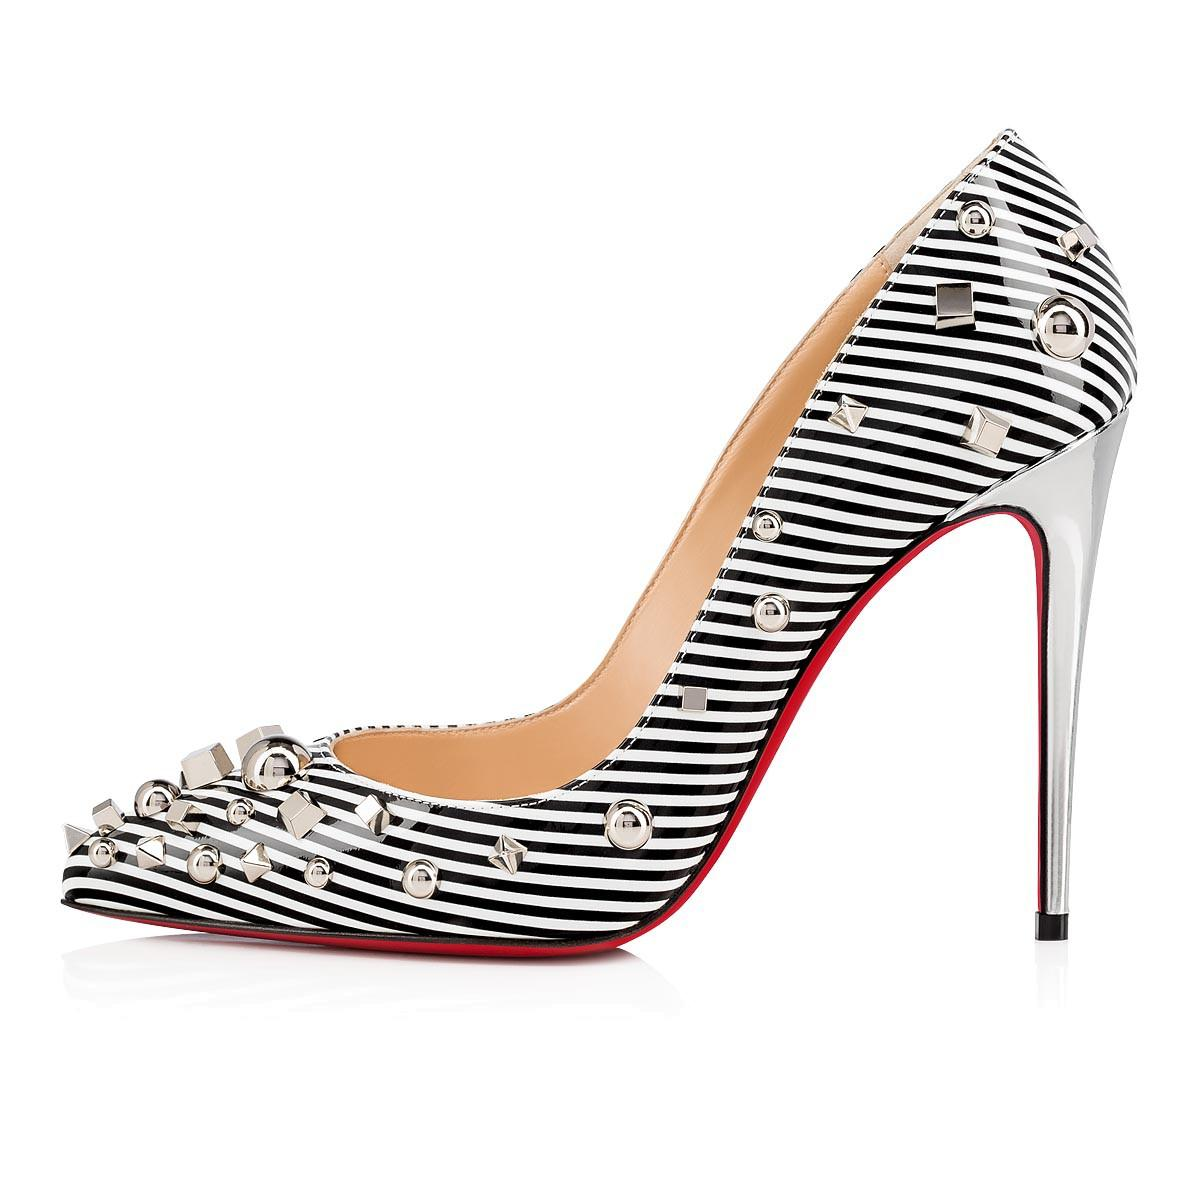 e8e5bd6a765e Christian Louboutin. Women s Aimanta 100 Stripe Patent Leather Point Toe  Pumps - Black White ...